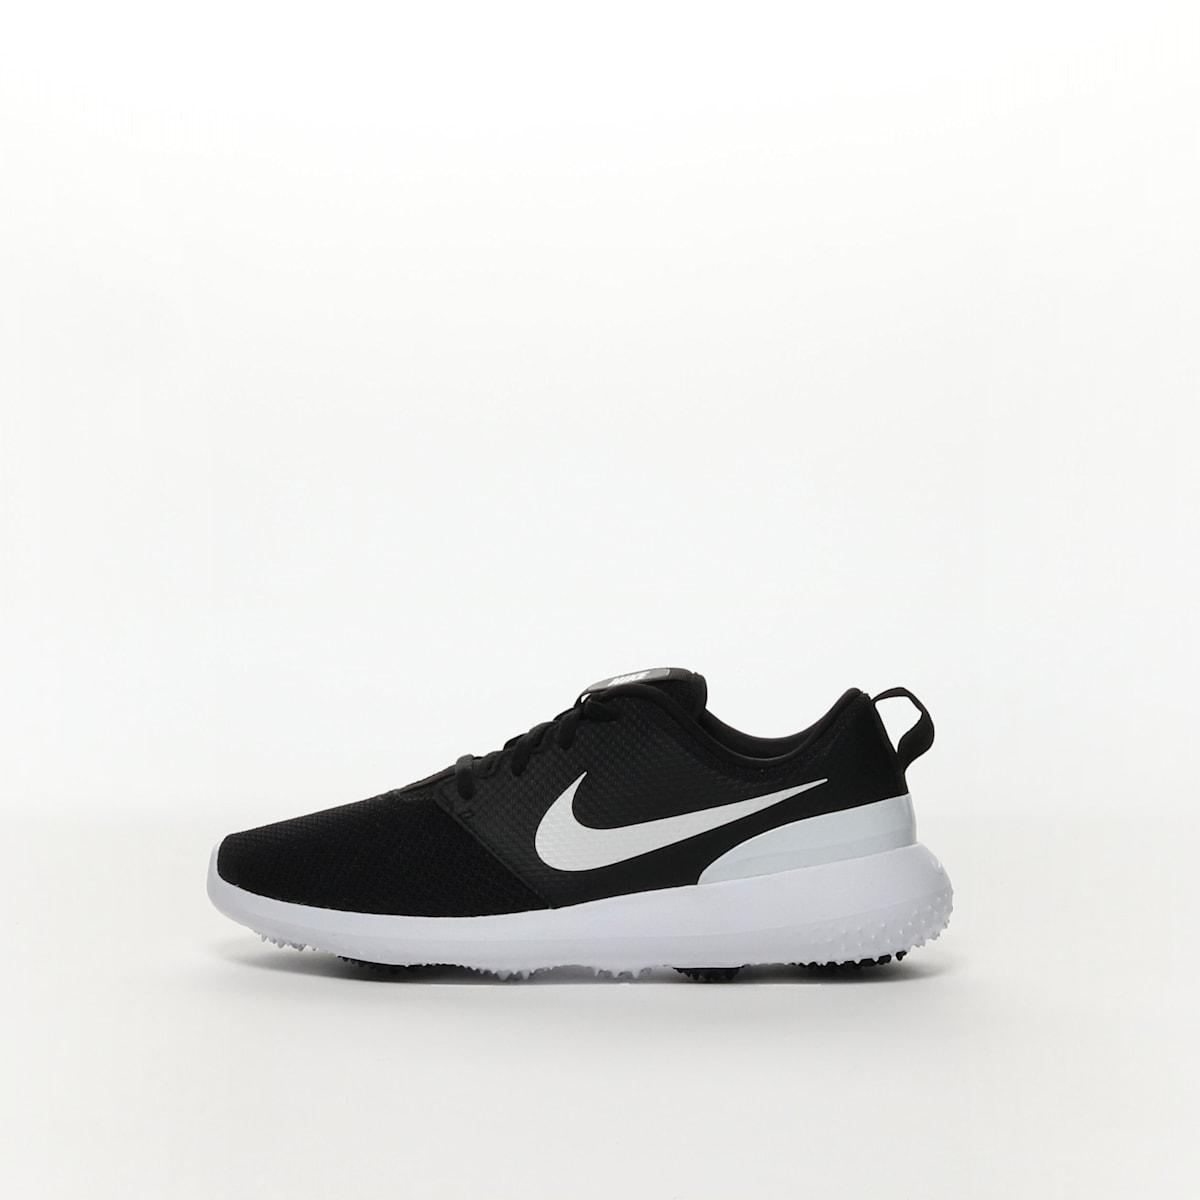 cf8afa3b32aba Nike Roshe G Women s Golf Shoe Nike Roshe G Shoe - BLACK WHITE – Resku